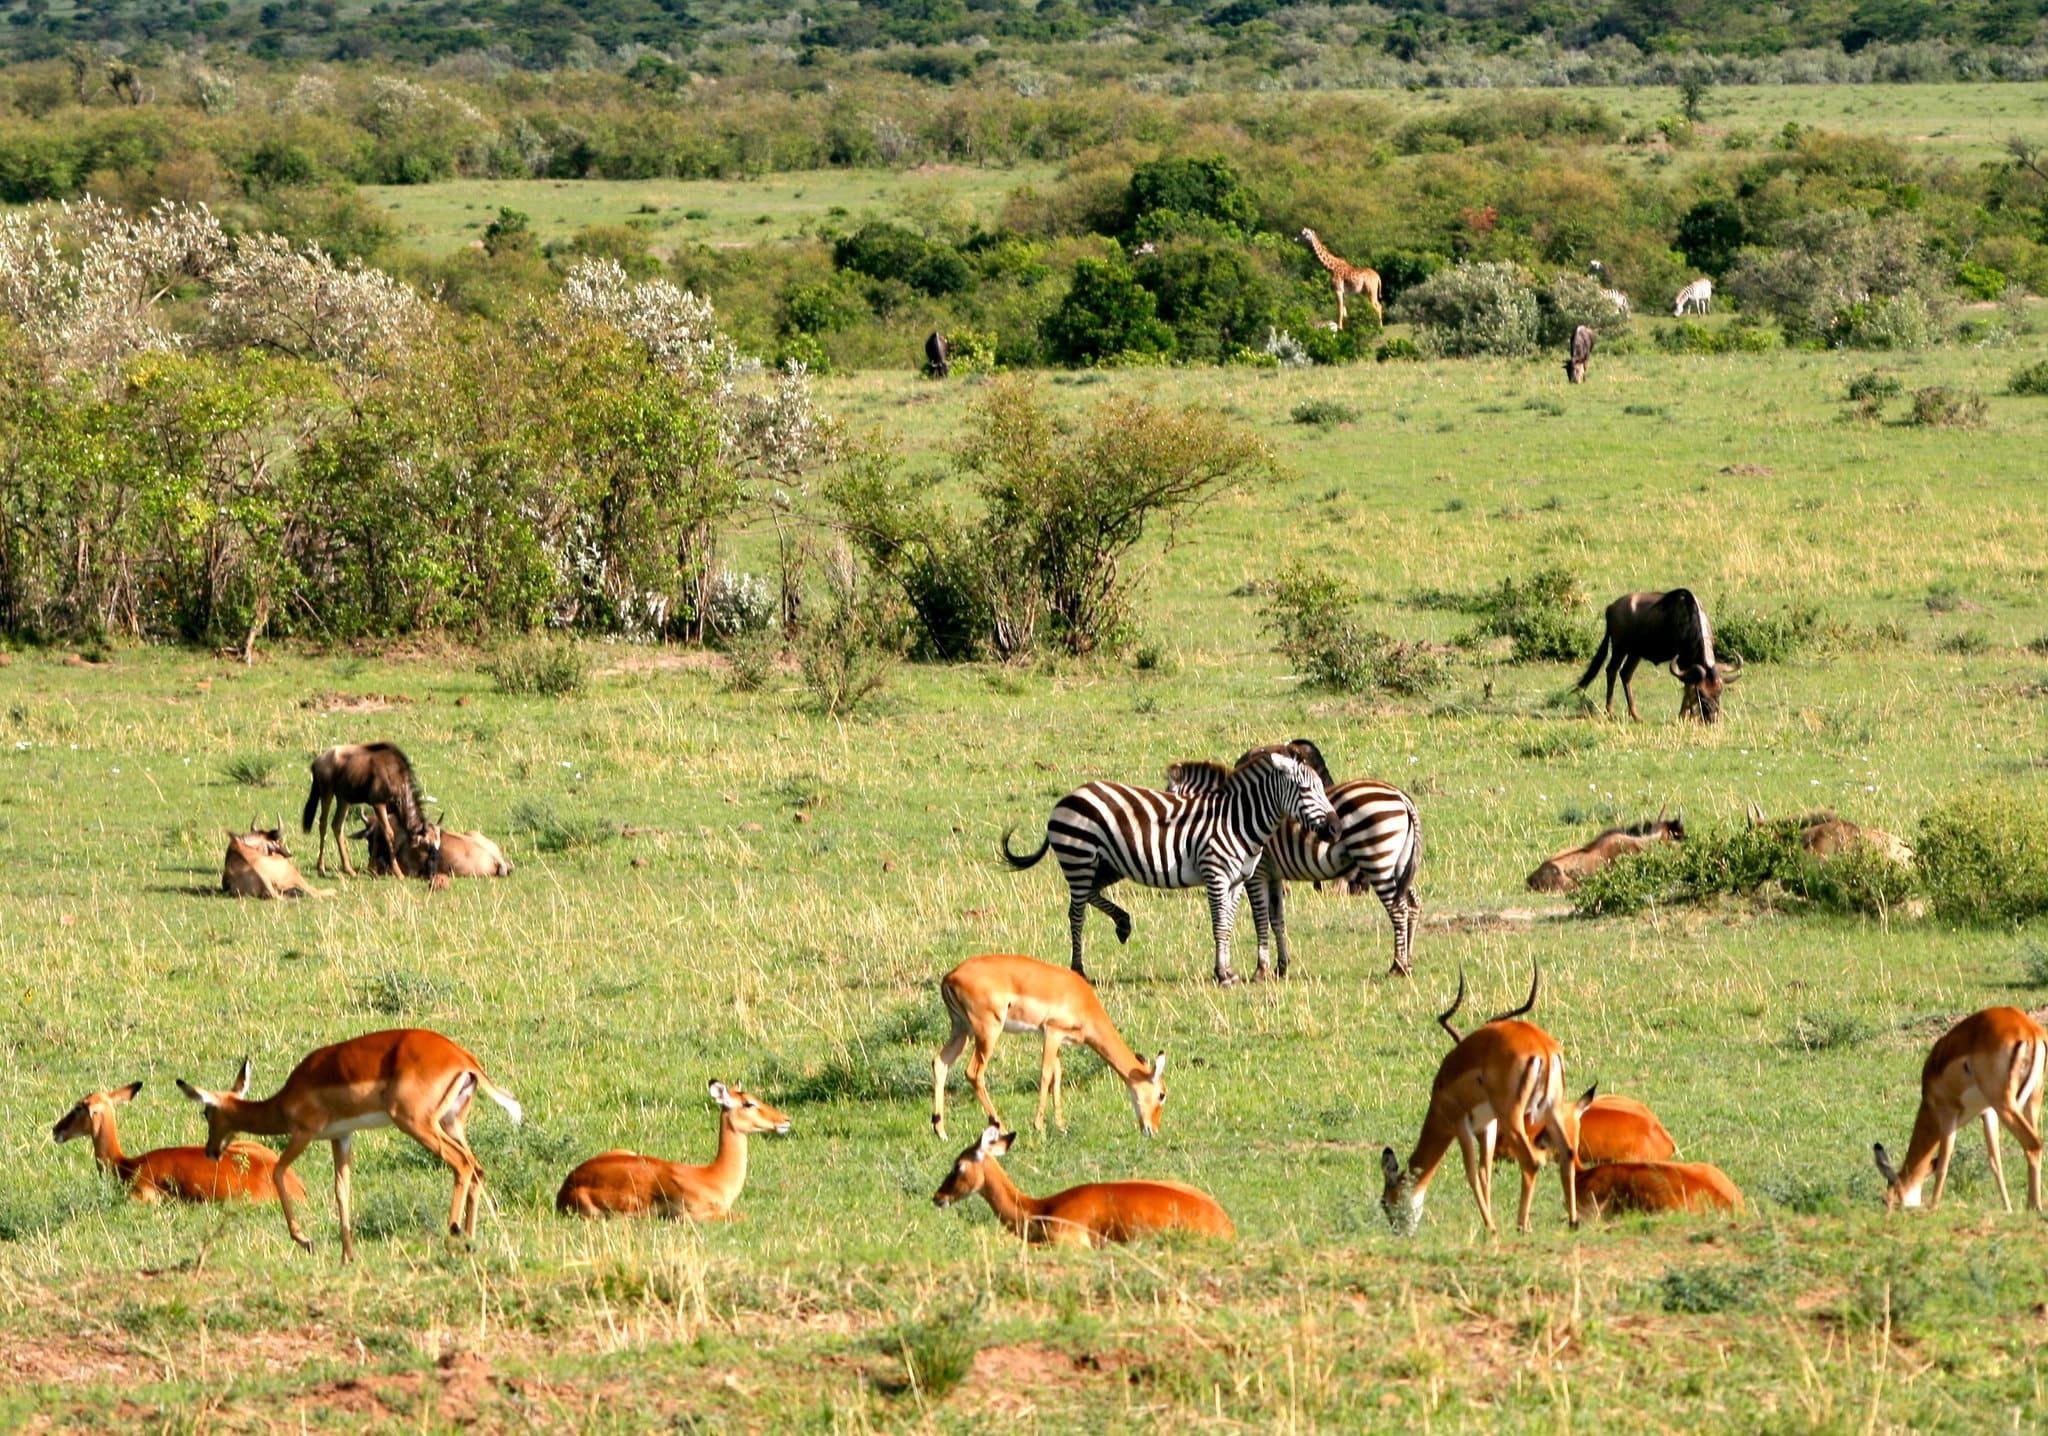 viaggiare sicuri kenya